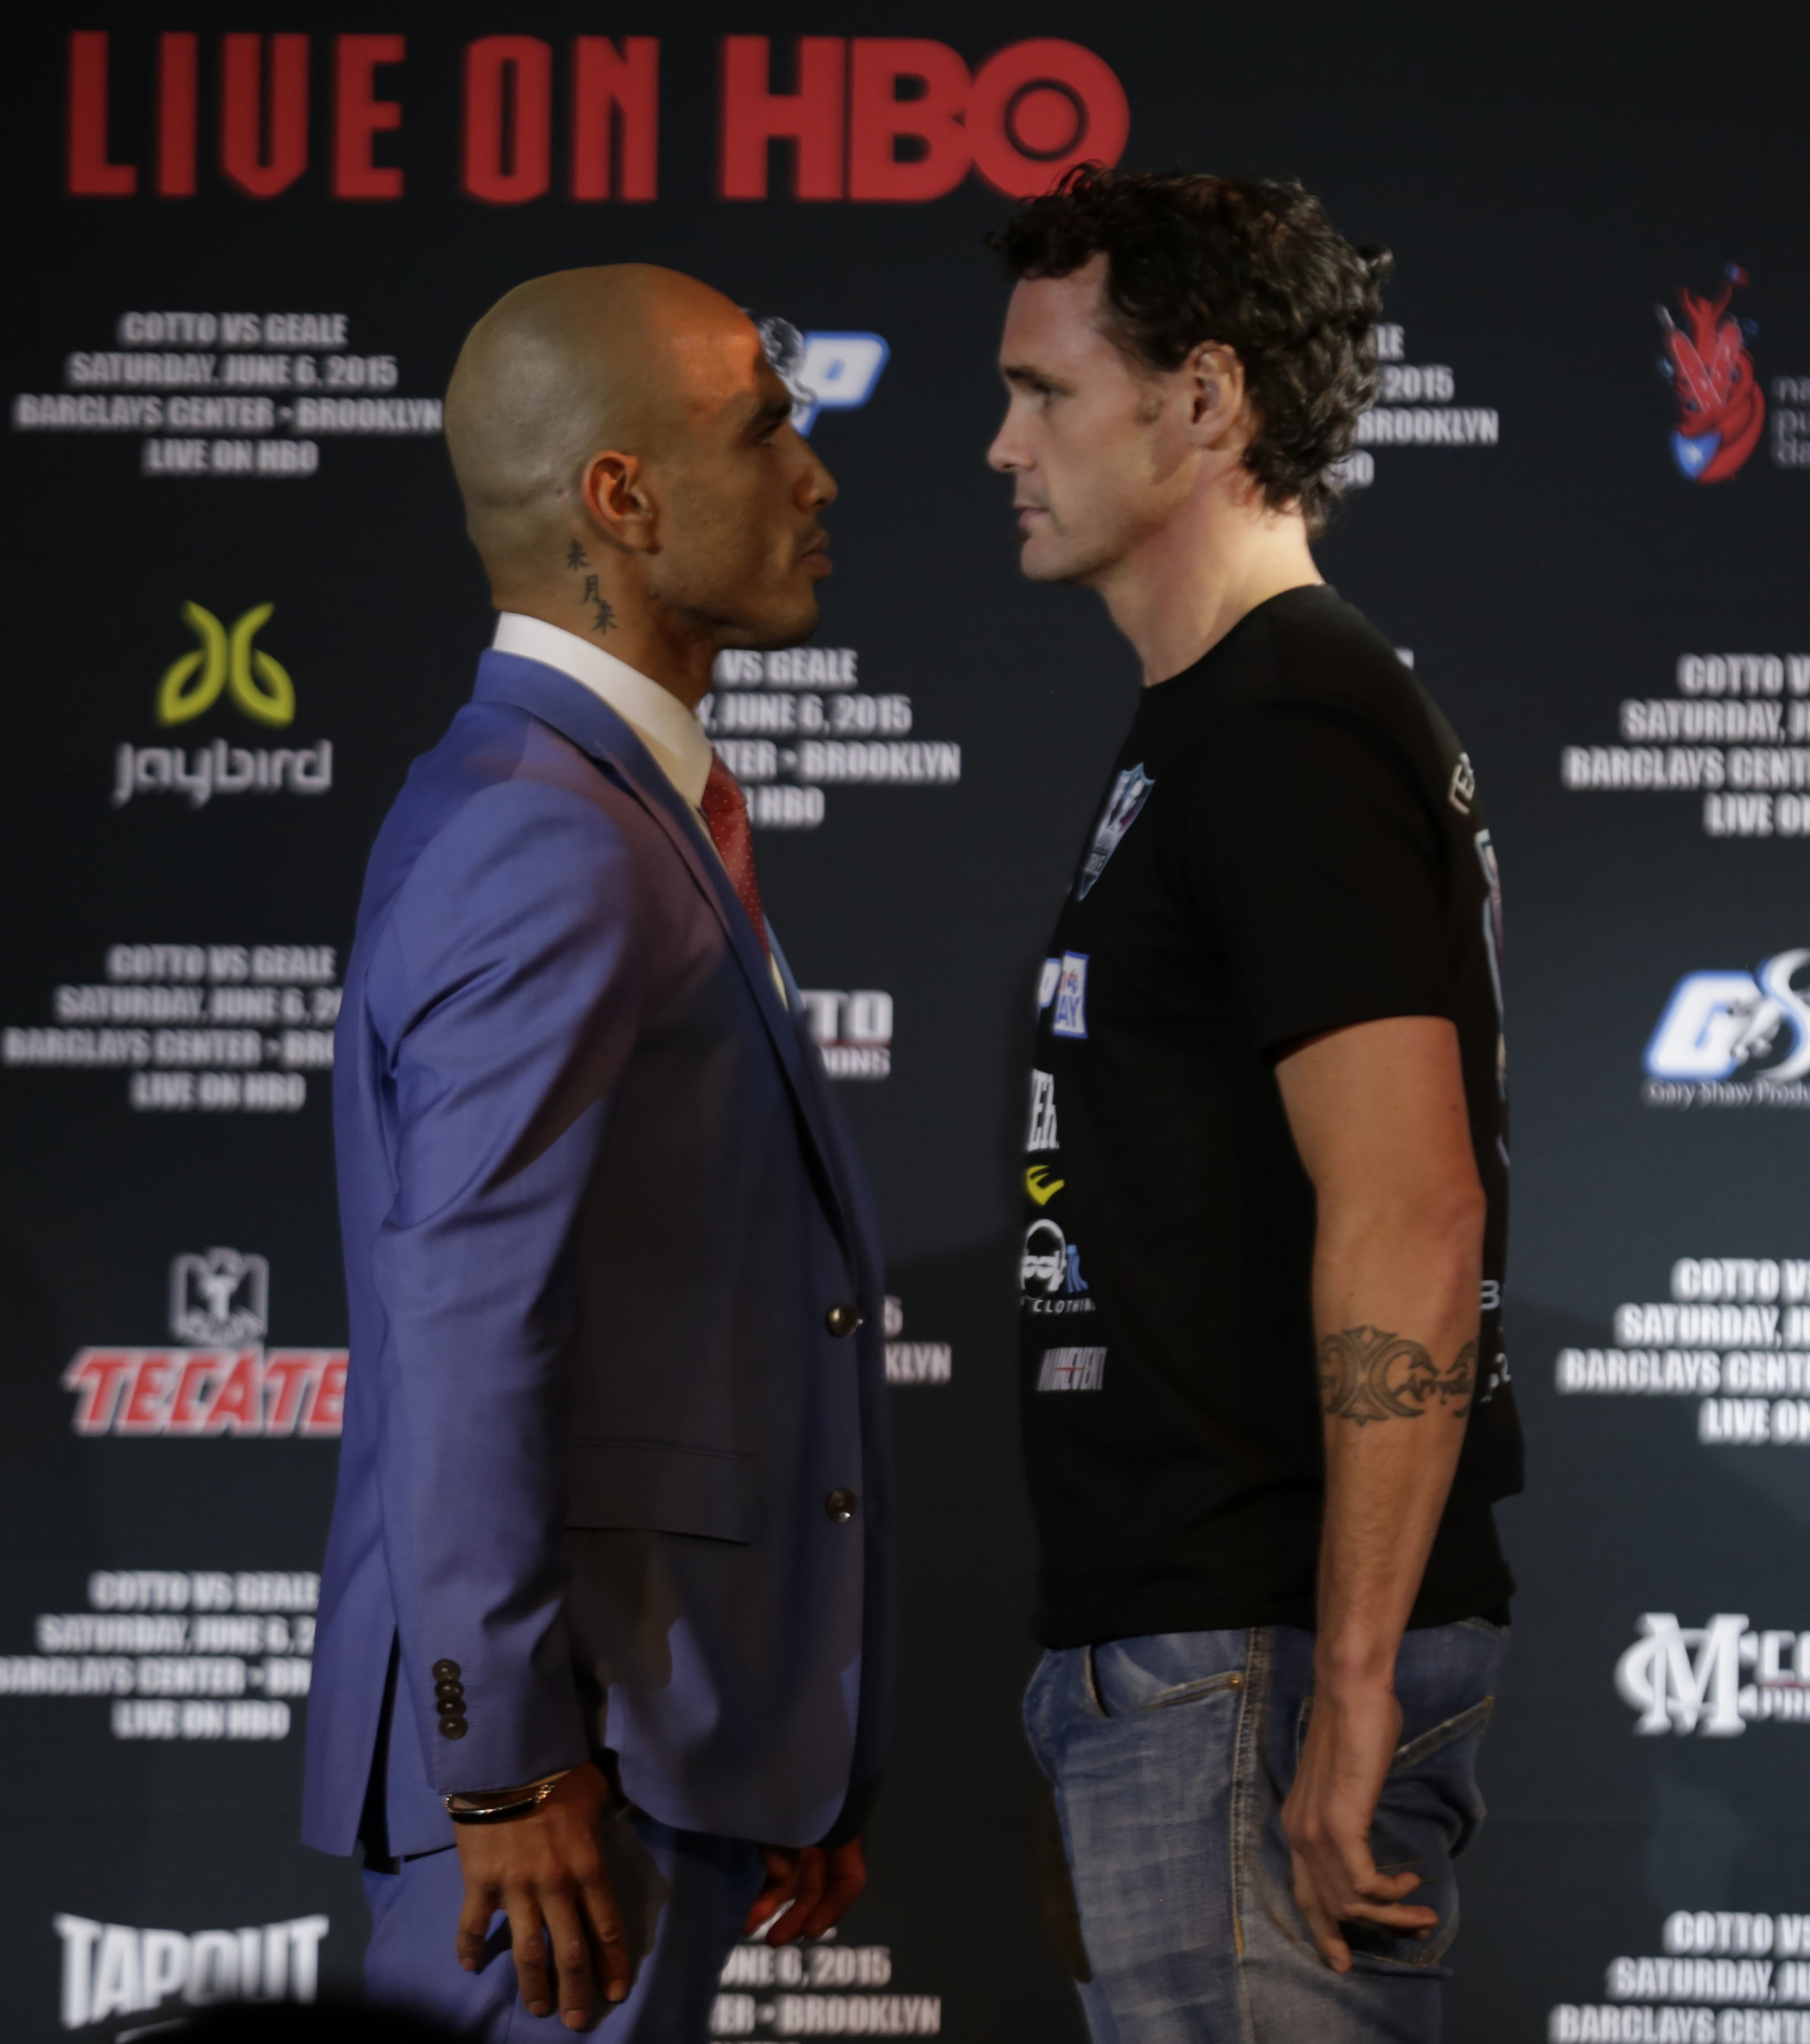 Press Conference Cotto vs Geale 18 (2).JPG